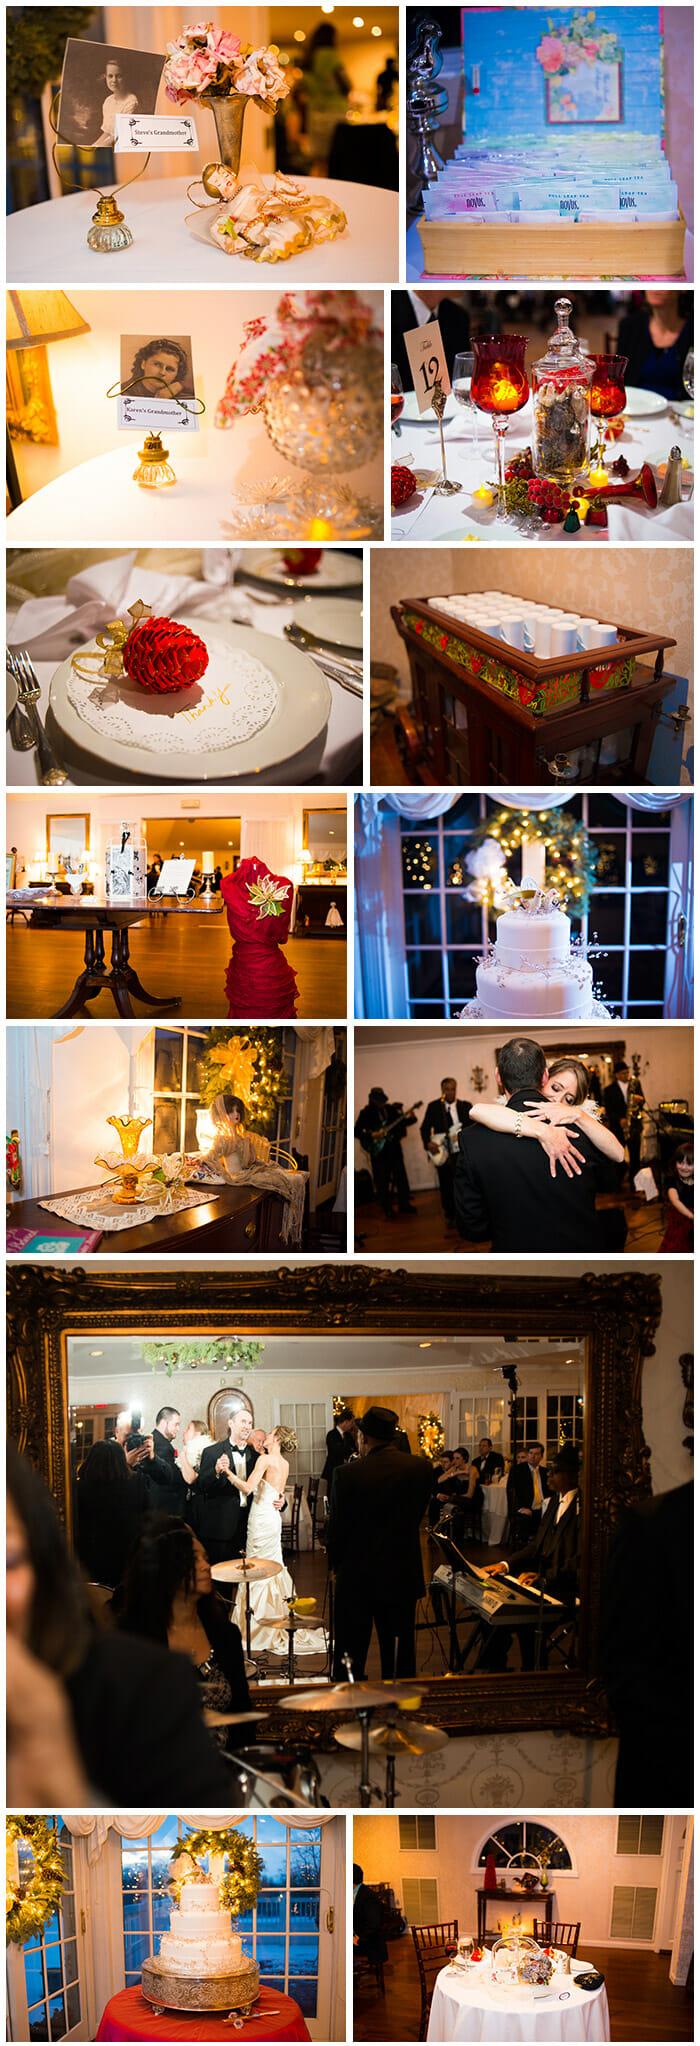 ANTRIM 1844 WEDDING by MarkLovettPhotography.com